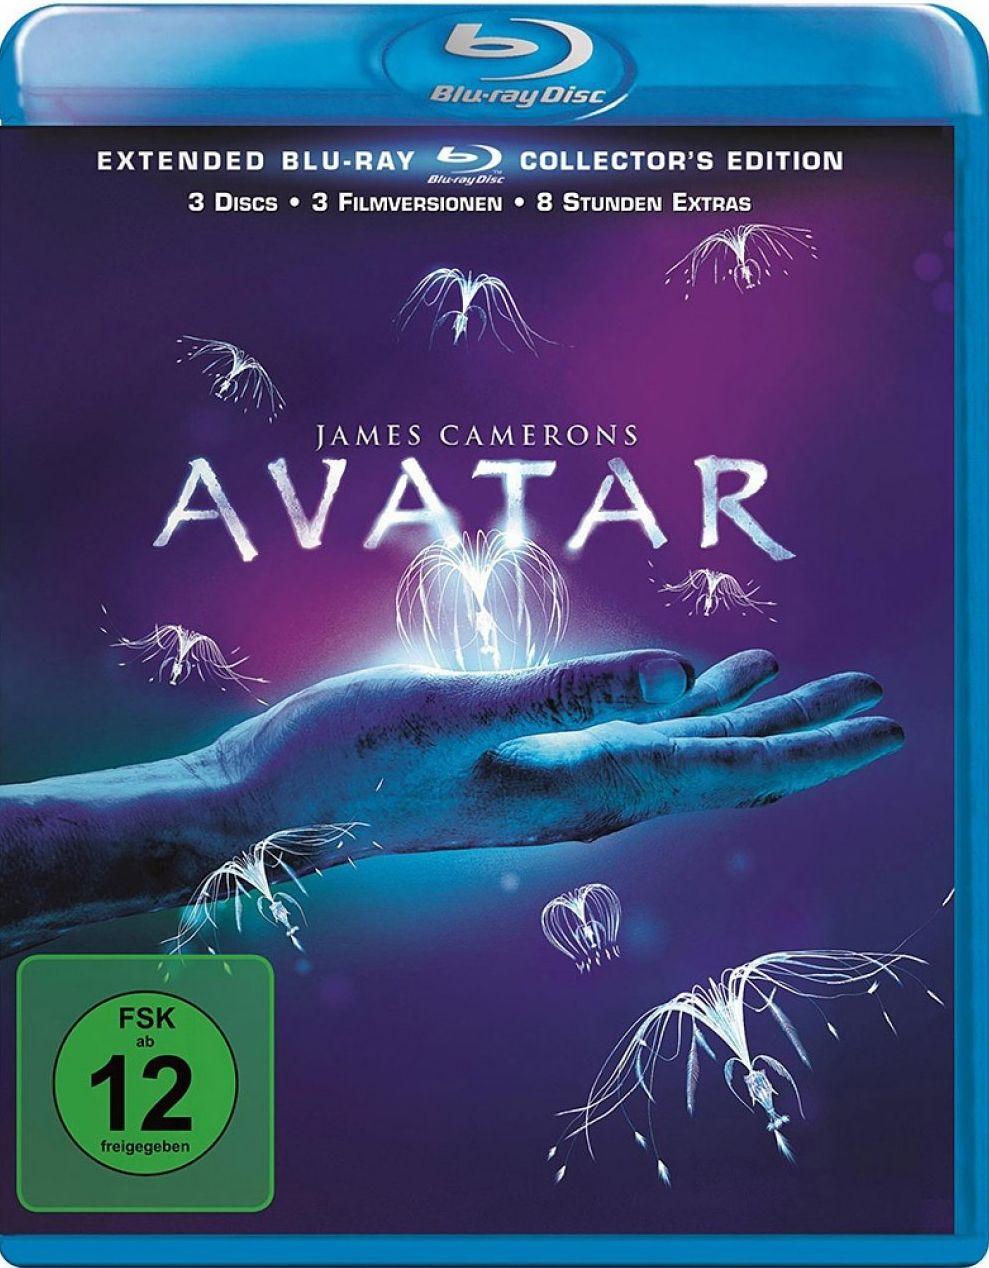 Avatar - Aufbruch nach Pandora (Extended Coll. Ed.) (Neuauflage) (3 Discs) (BLURAY)